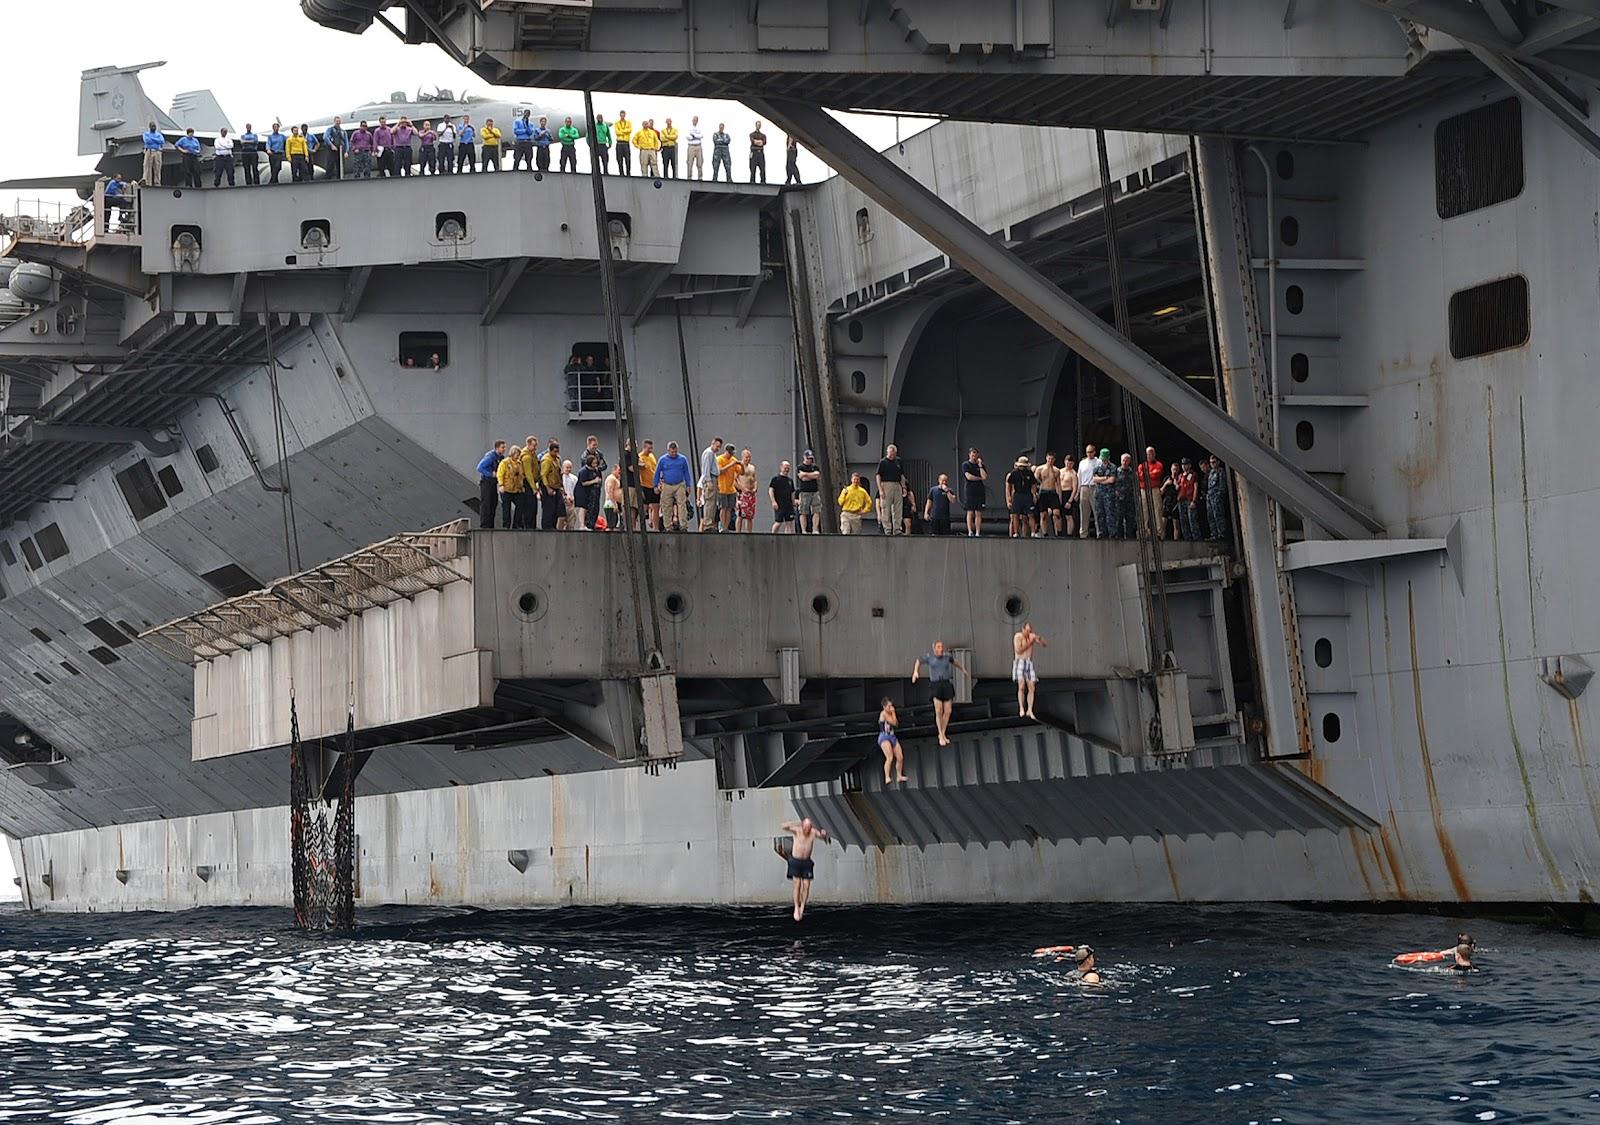 Paul Davis On Crime Cool Navy Photo Carrier All Hands